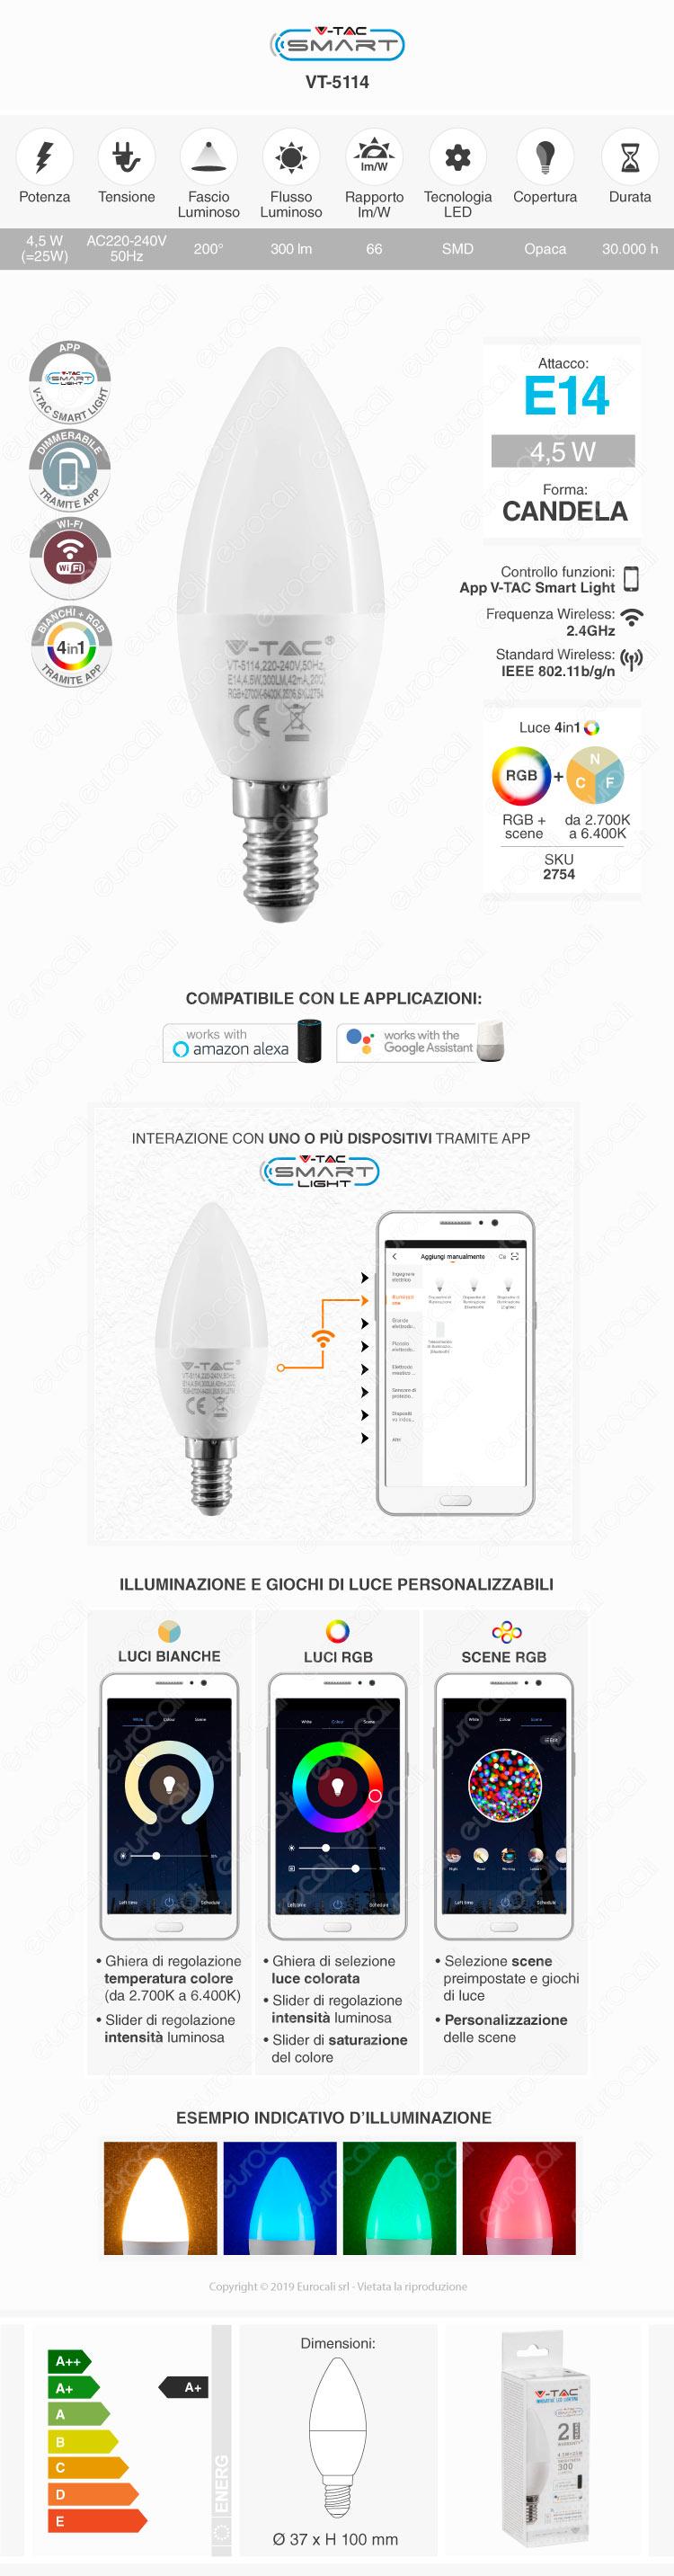 V-Tac Smart VT-5114 Lampadina LED Wi-Fi E14 4,5W Candela RGB+W Dimmerabile